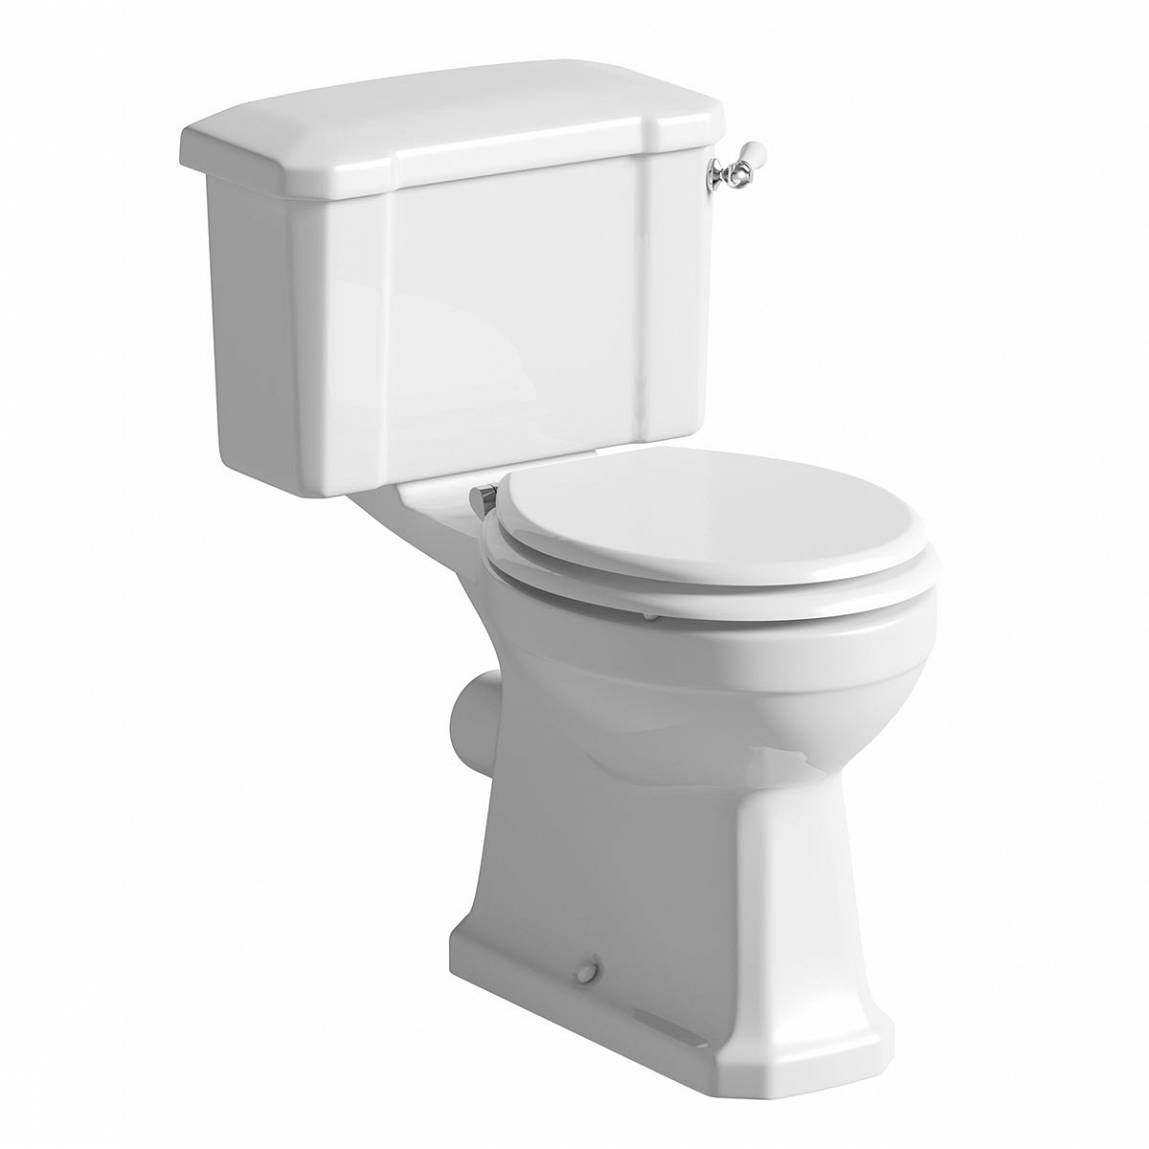 Plumbs bathroom suites - Camberley Close Coupled Toilet Inc Luxury White Soft Close Seat Victoria Plumb Bathrooms Onlinebathrooms Suitesbudget